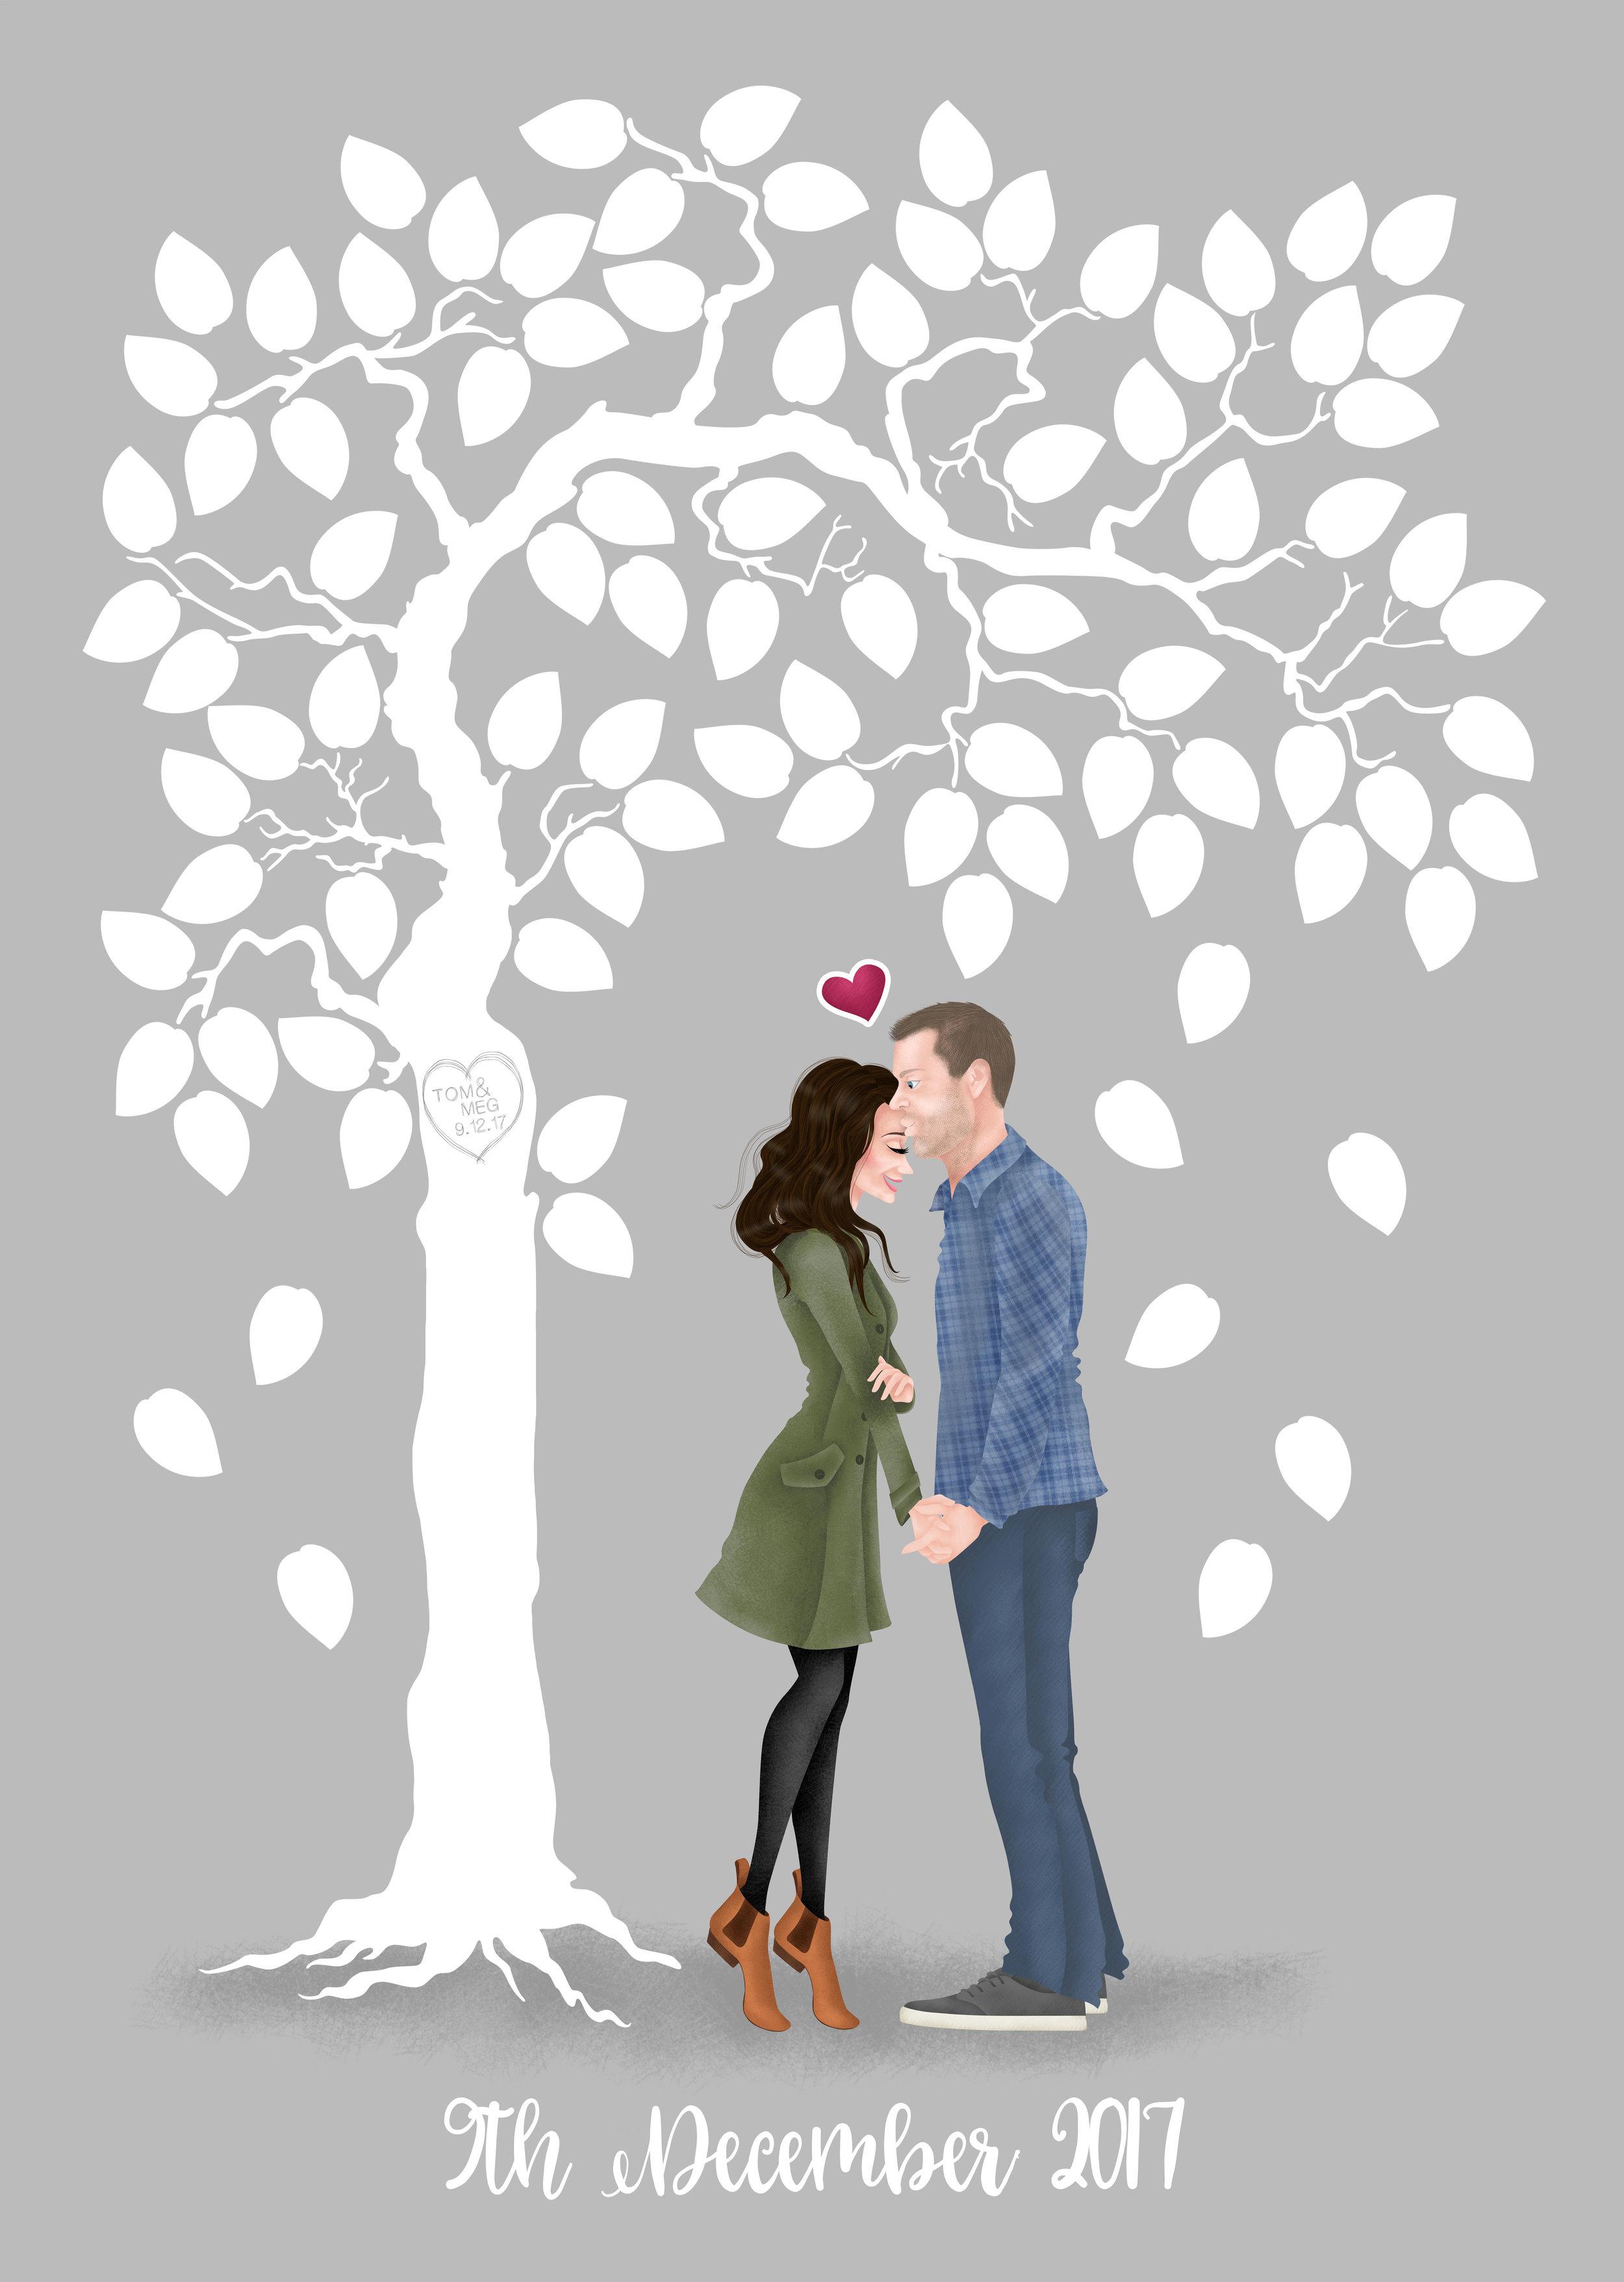 Hannah Weeks Illustration - Tom and Meg Fingerprint Tree - A2 plus 5mm bleed.jpg